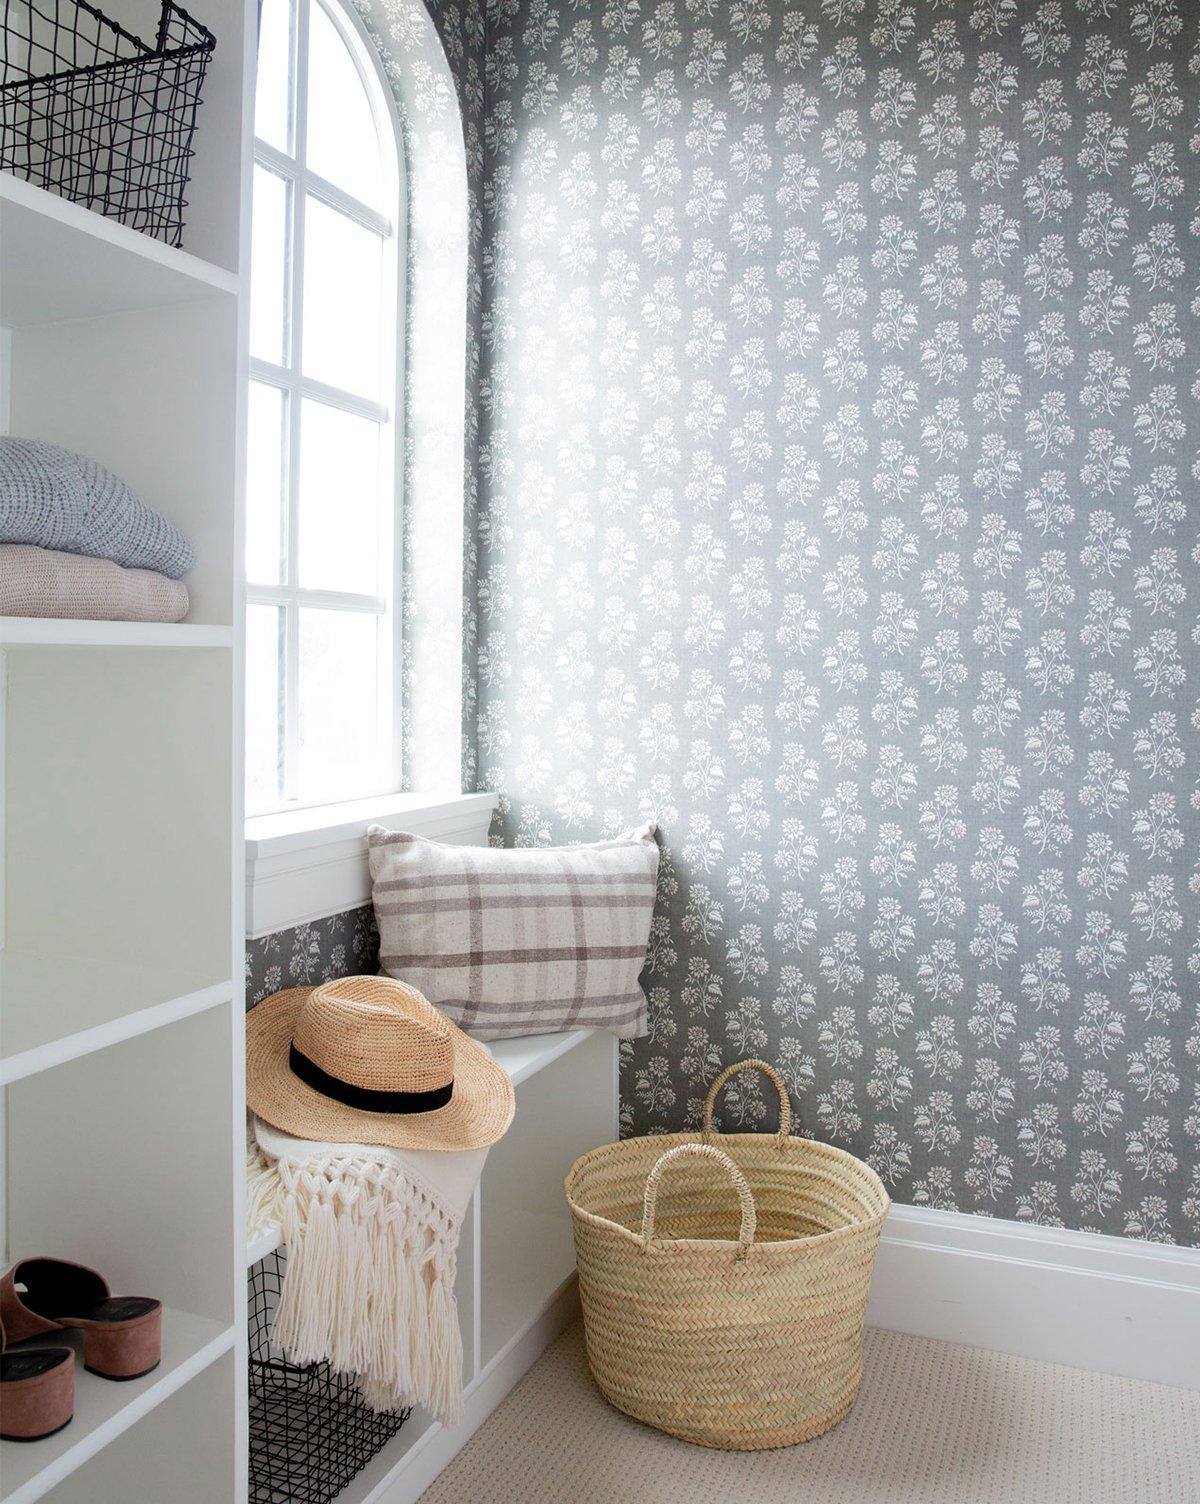 wallpaper2 (1).jpg